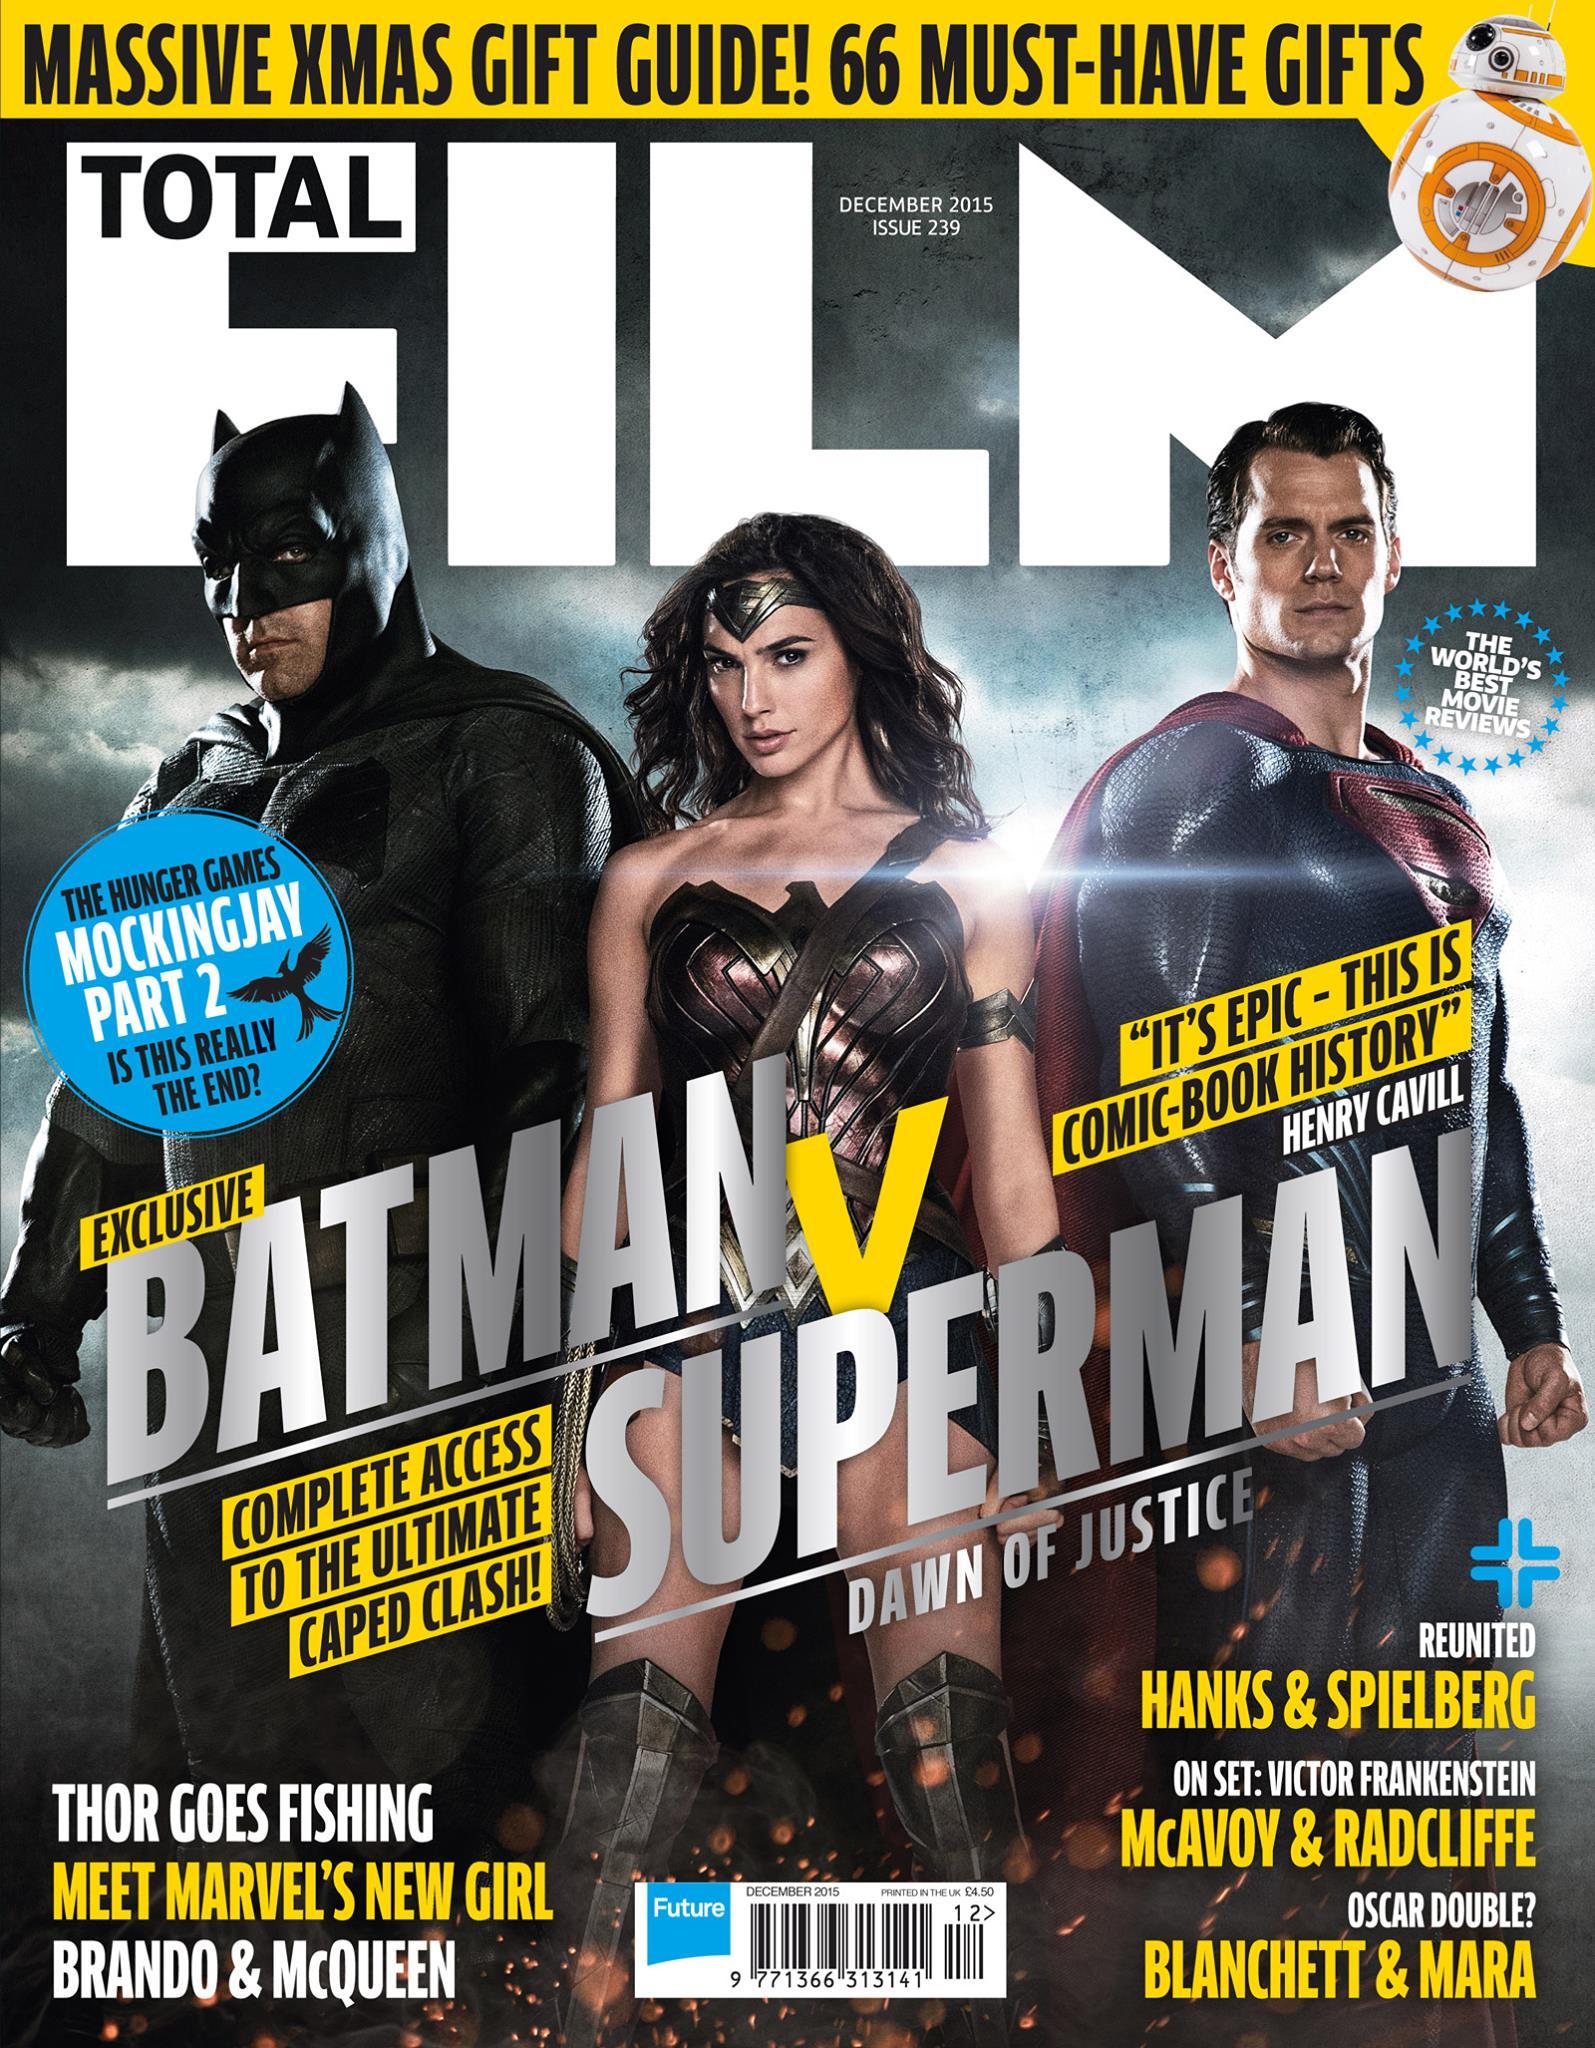 Total Film - Batman v Superman Dawn of Justice cover shot